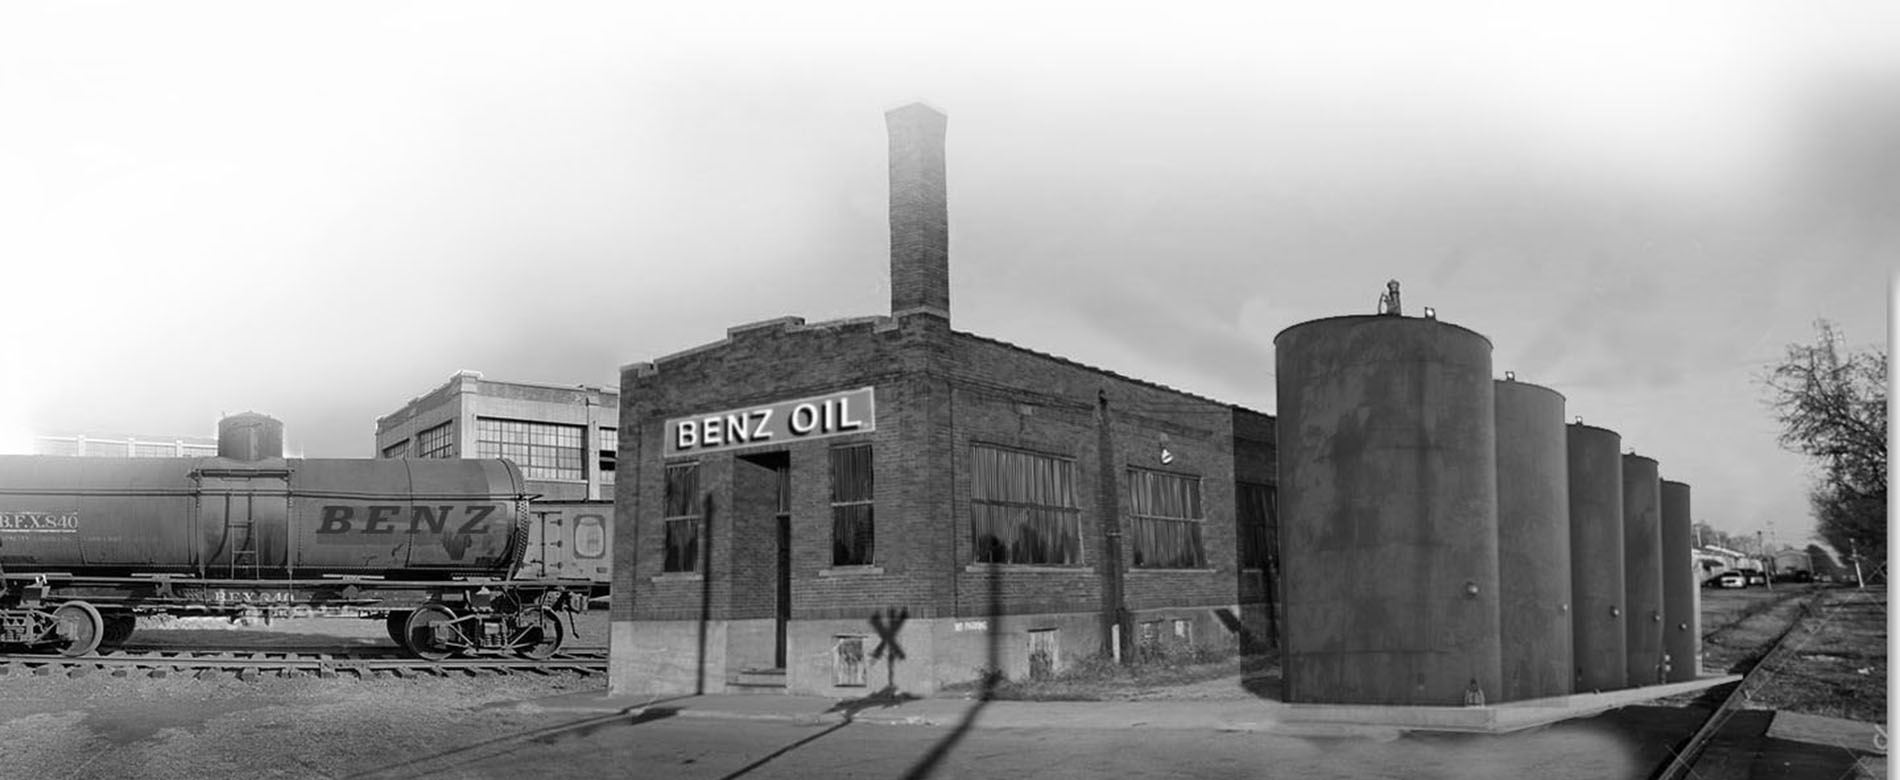 benz oil storefront, benz oil rail spur, metalworking fluids, metalworking fluids manufacturer